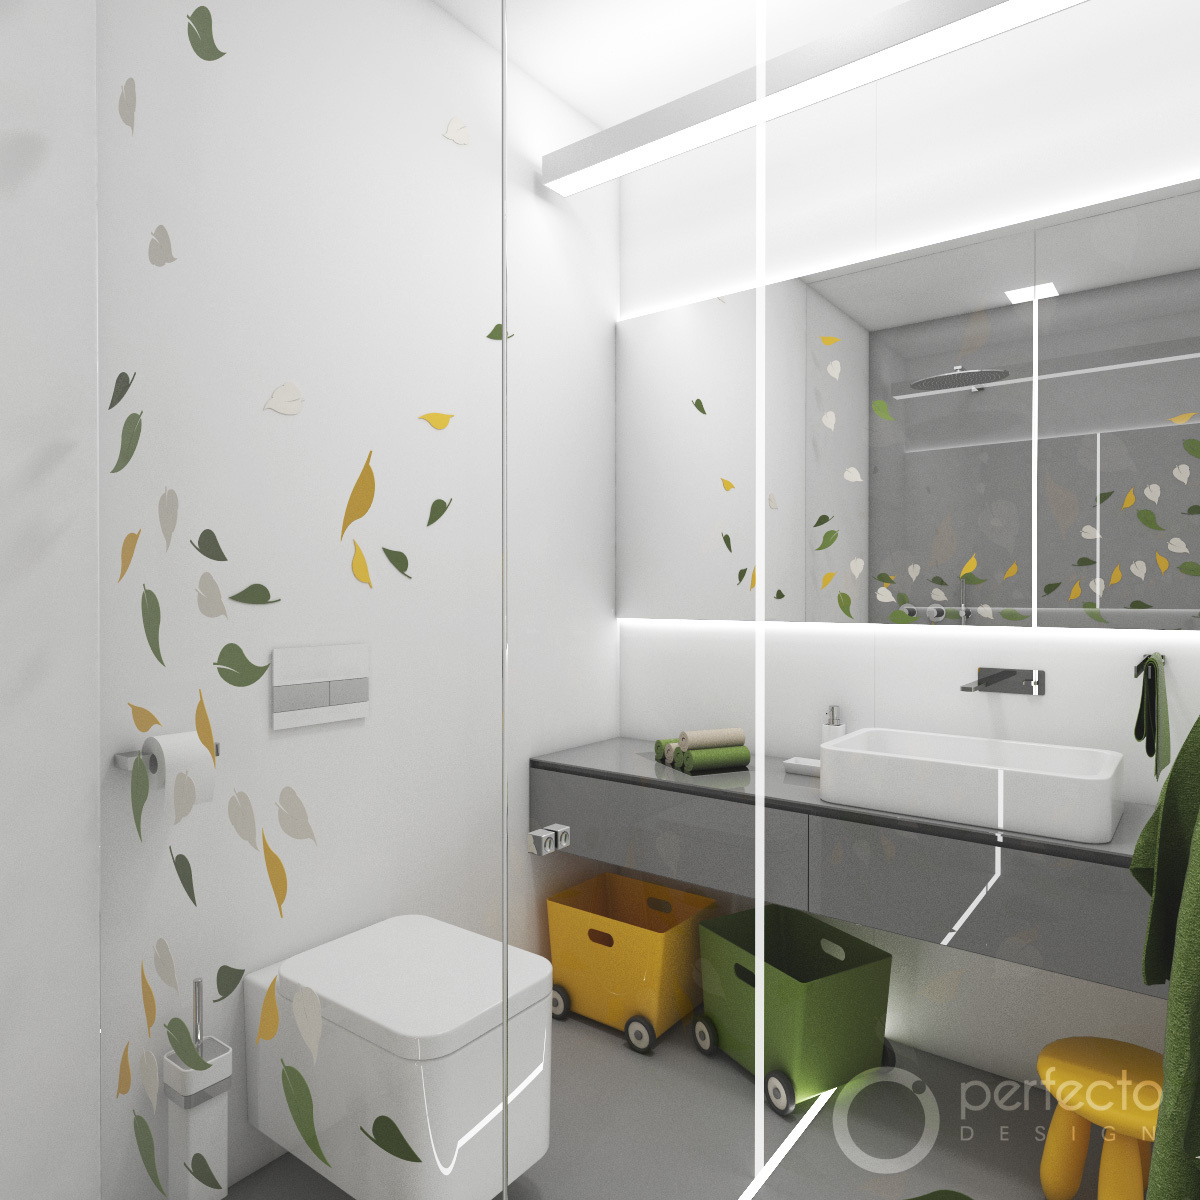 kinder-badezimmer jungle | perfecto design, Badezimmer